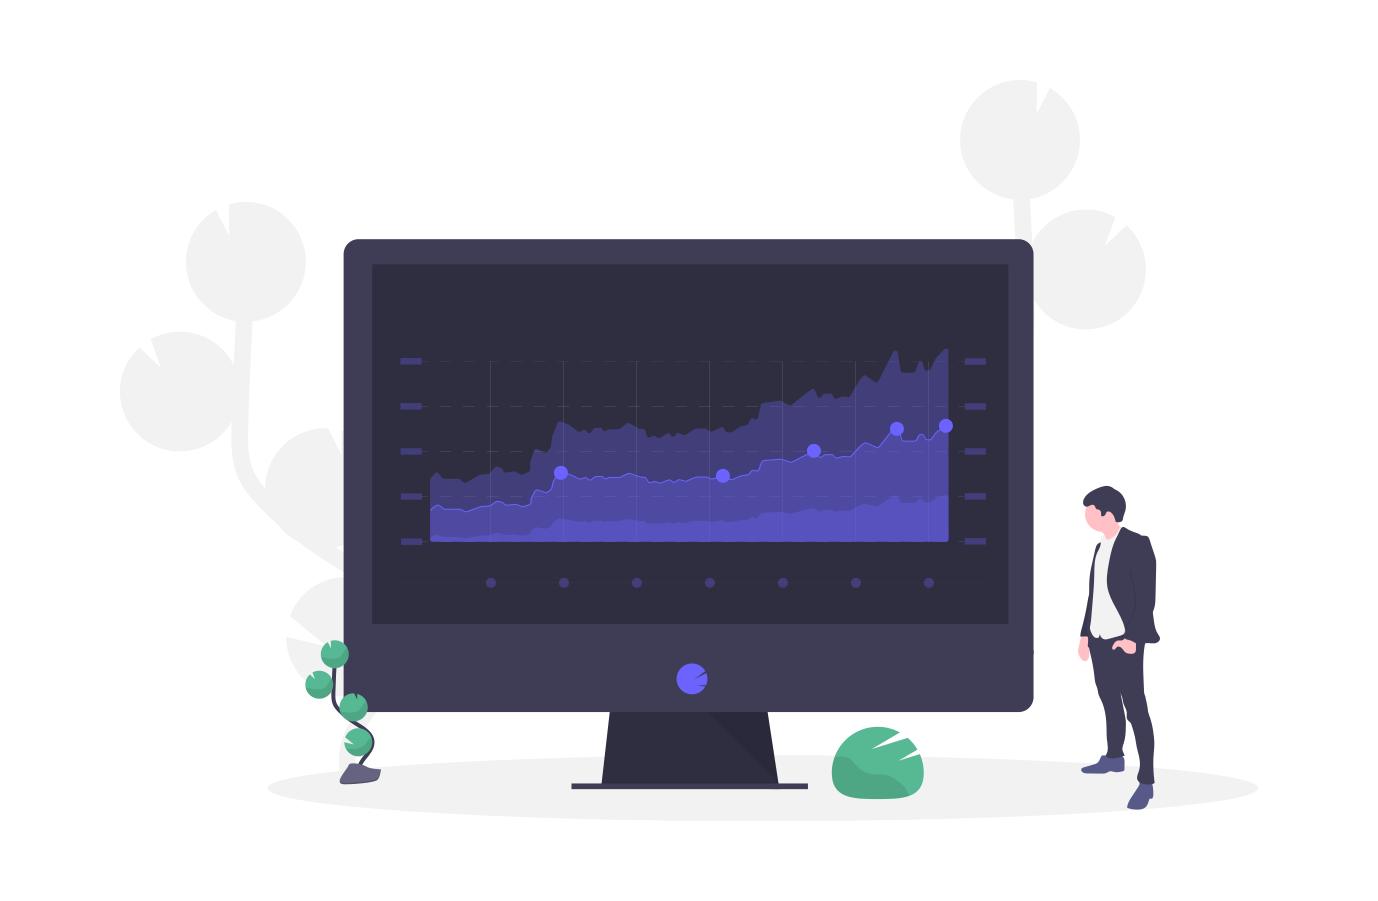 undraw_financial_data_es63